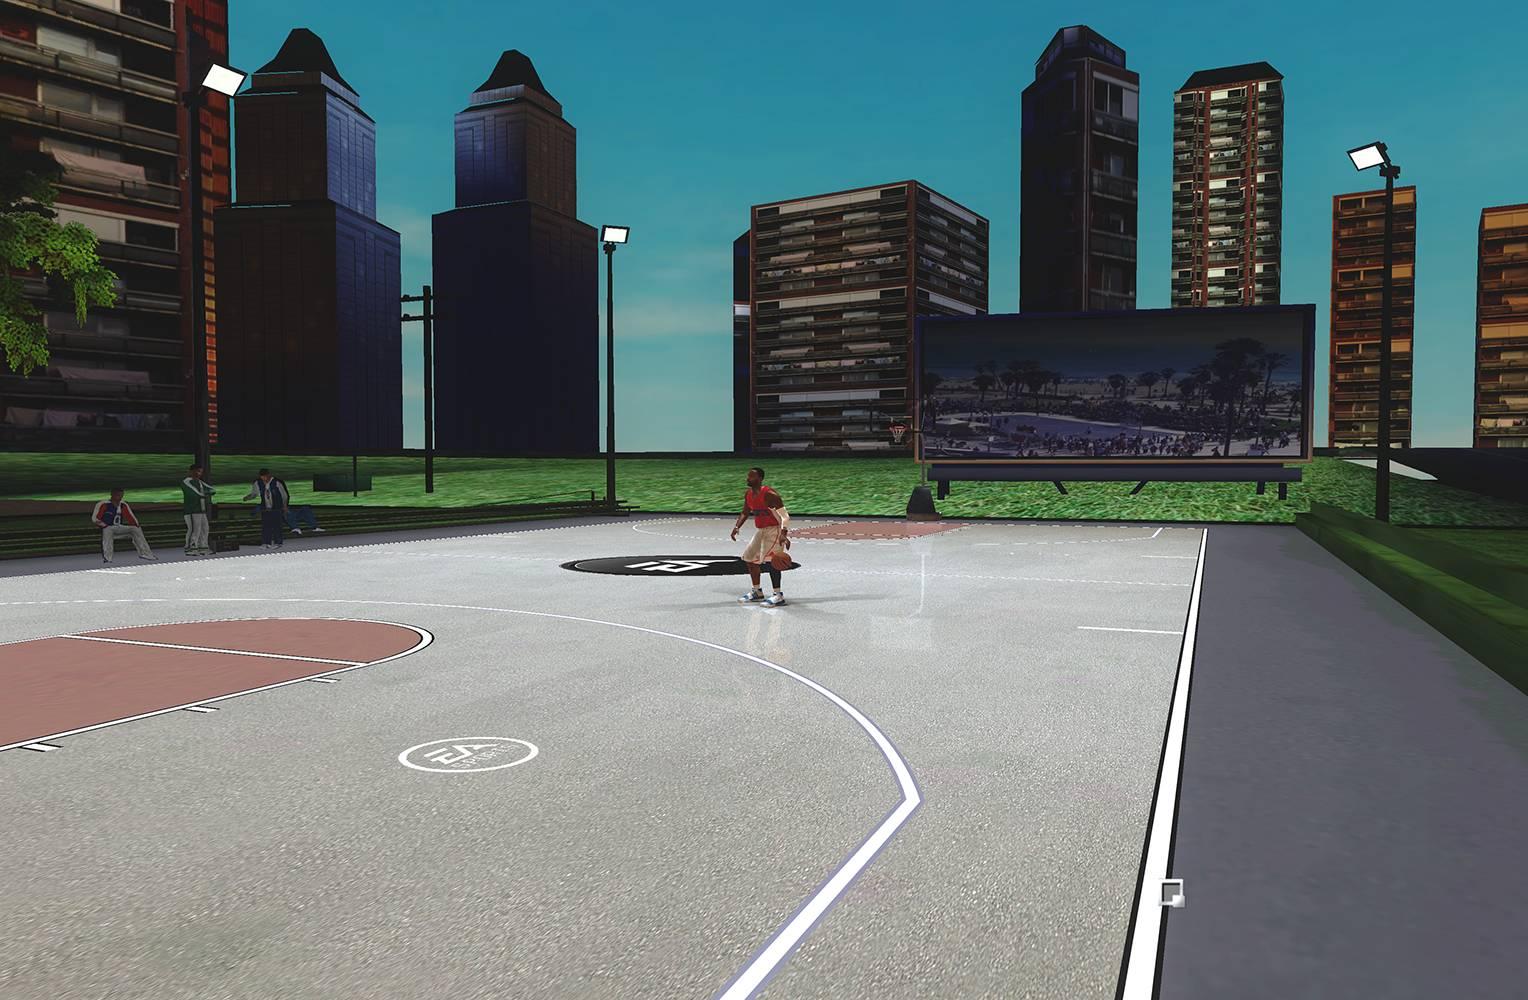 NBA LIVE 08【4K】-2021-03-23-01-21-08-385副本.jpg